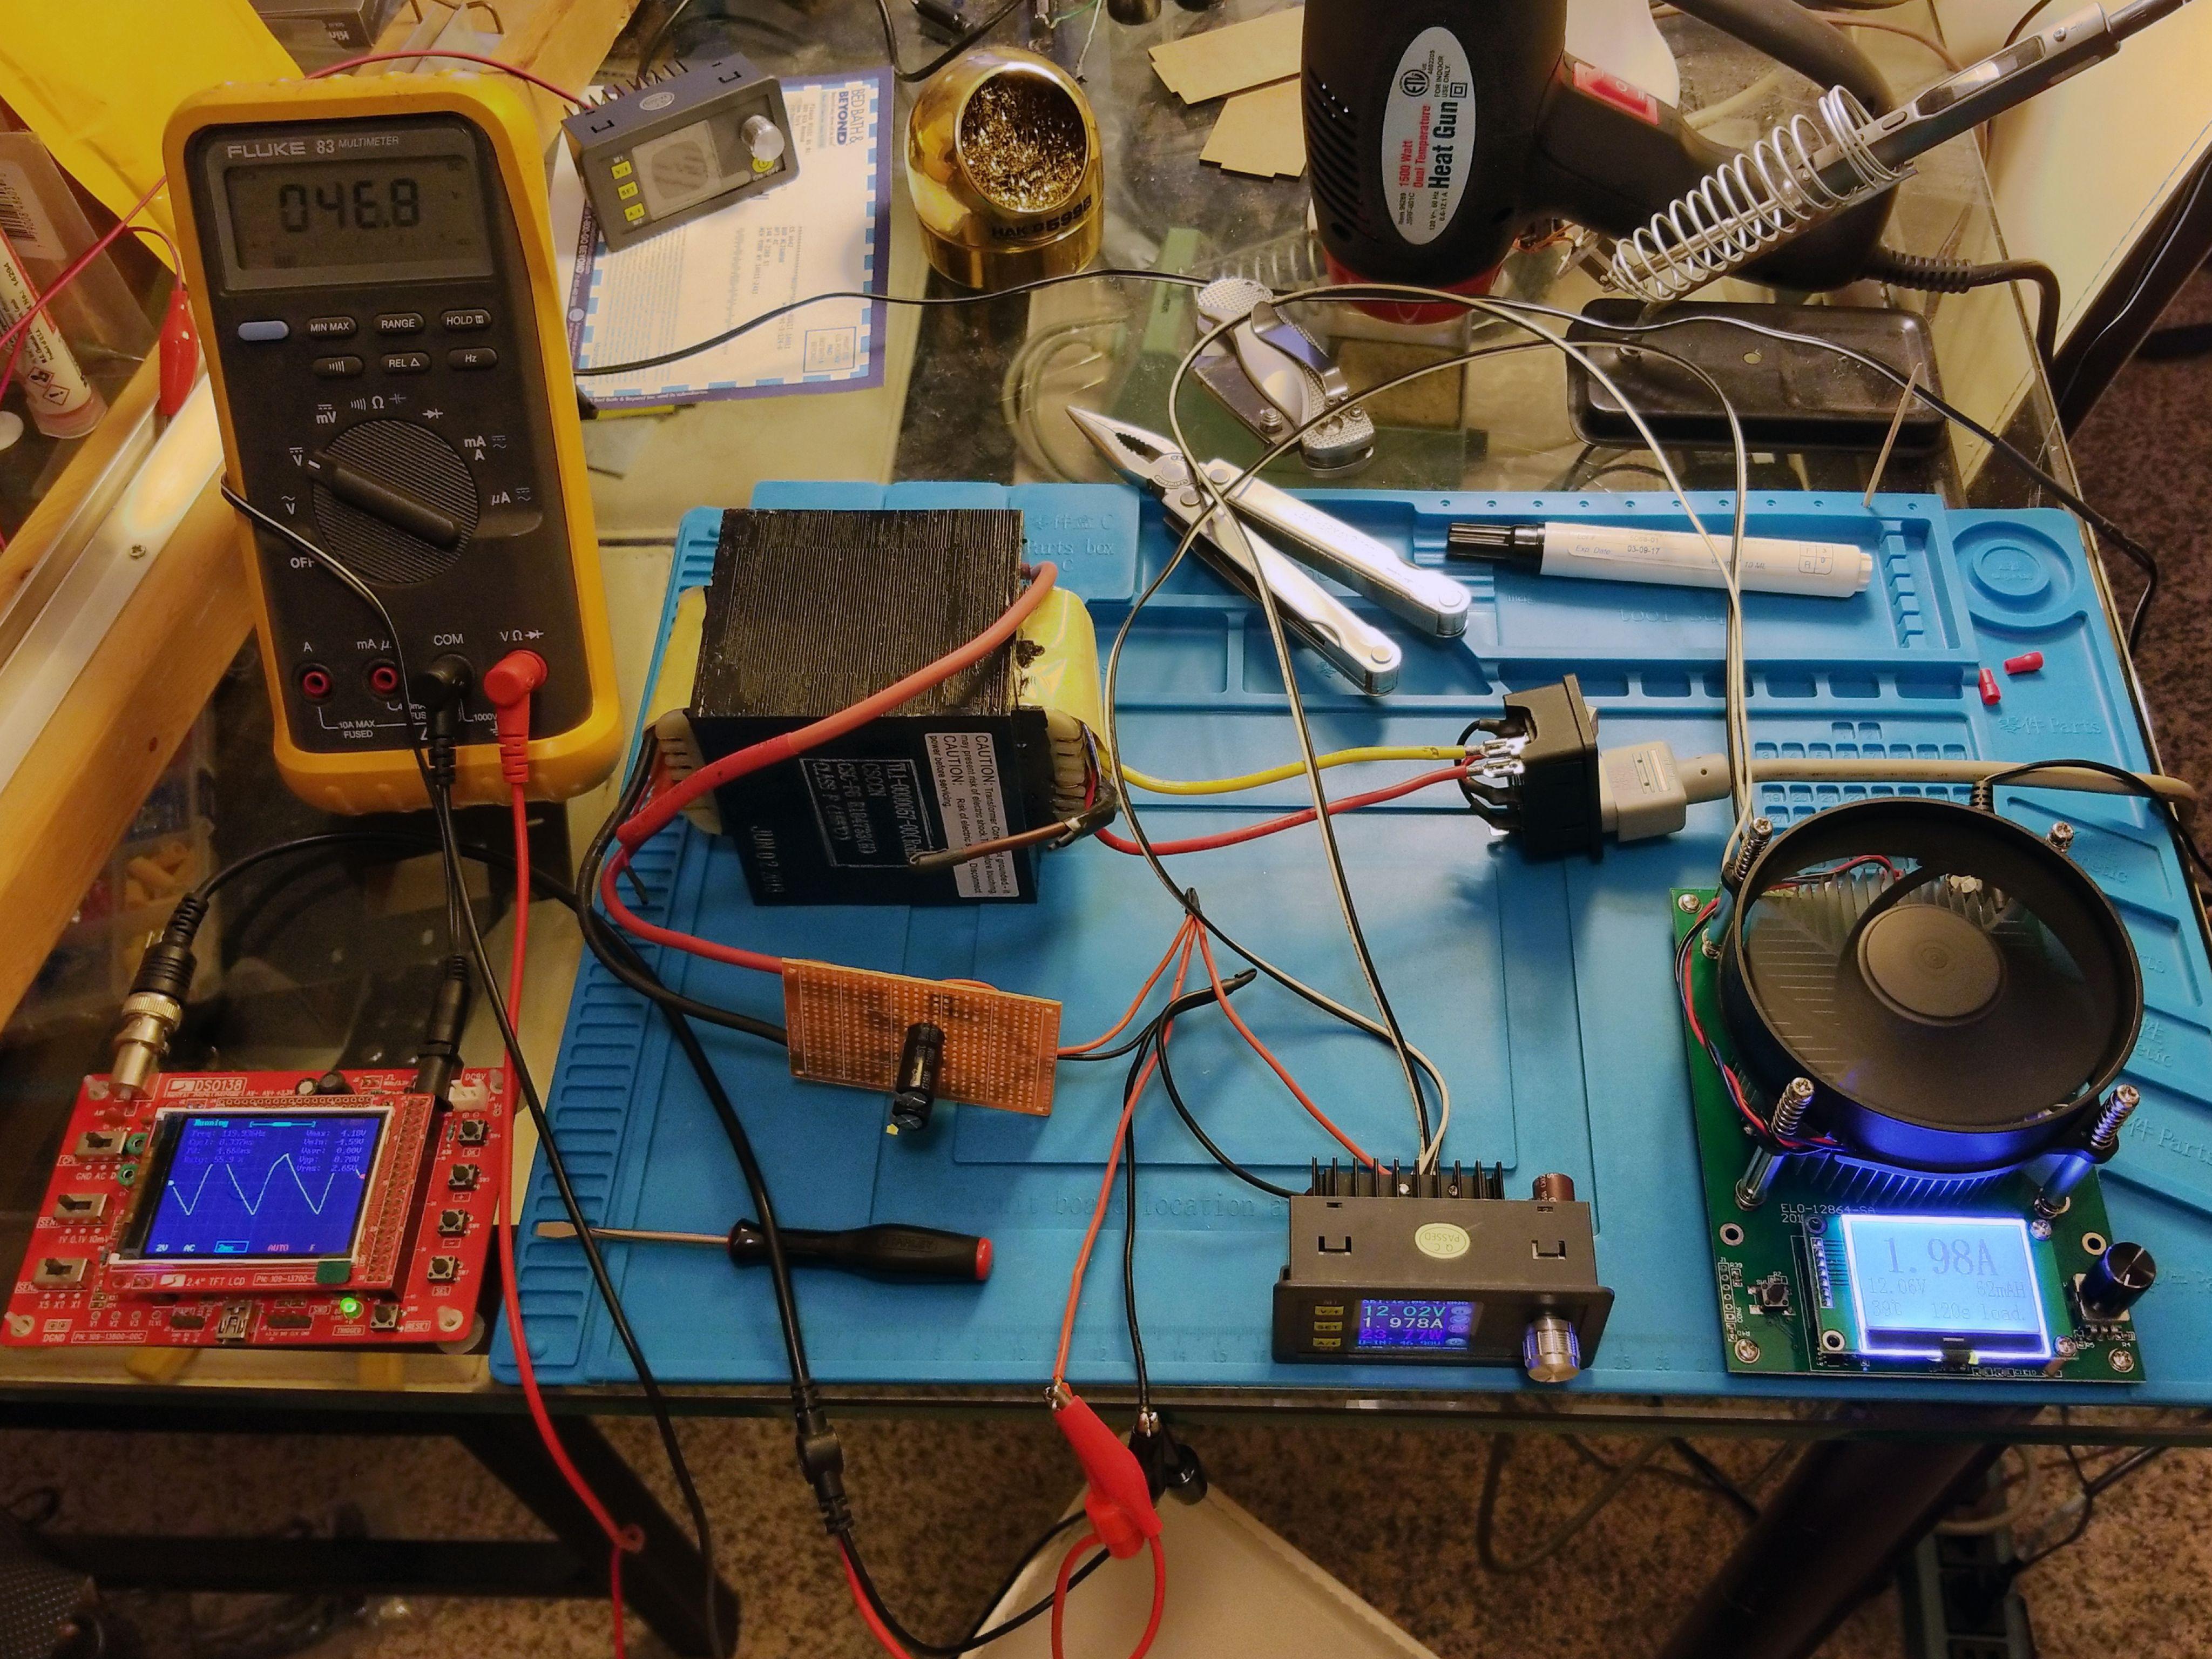 Power Supply Hurdles Making Arantiuscom 01v To 50v Variable An End Test Set Up Of My